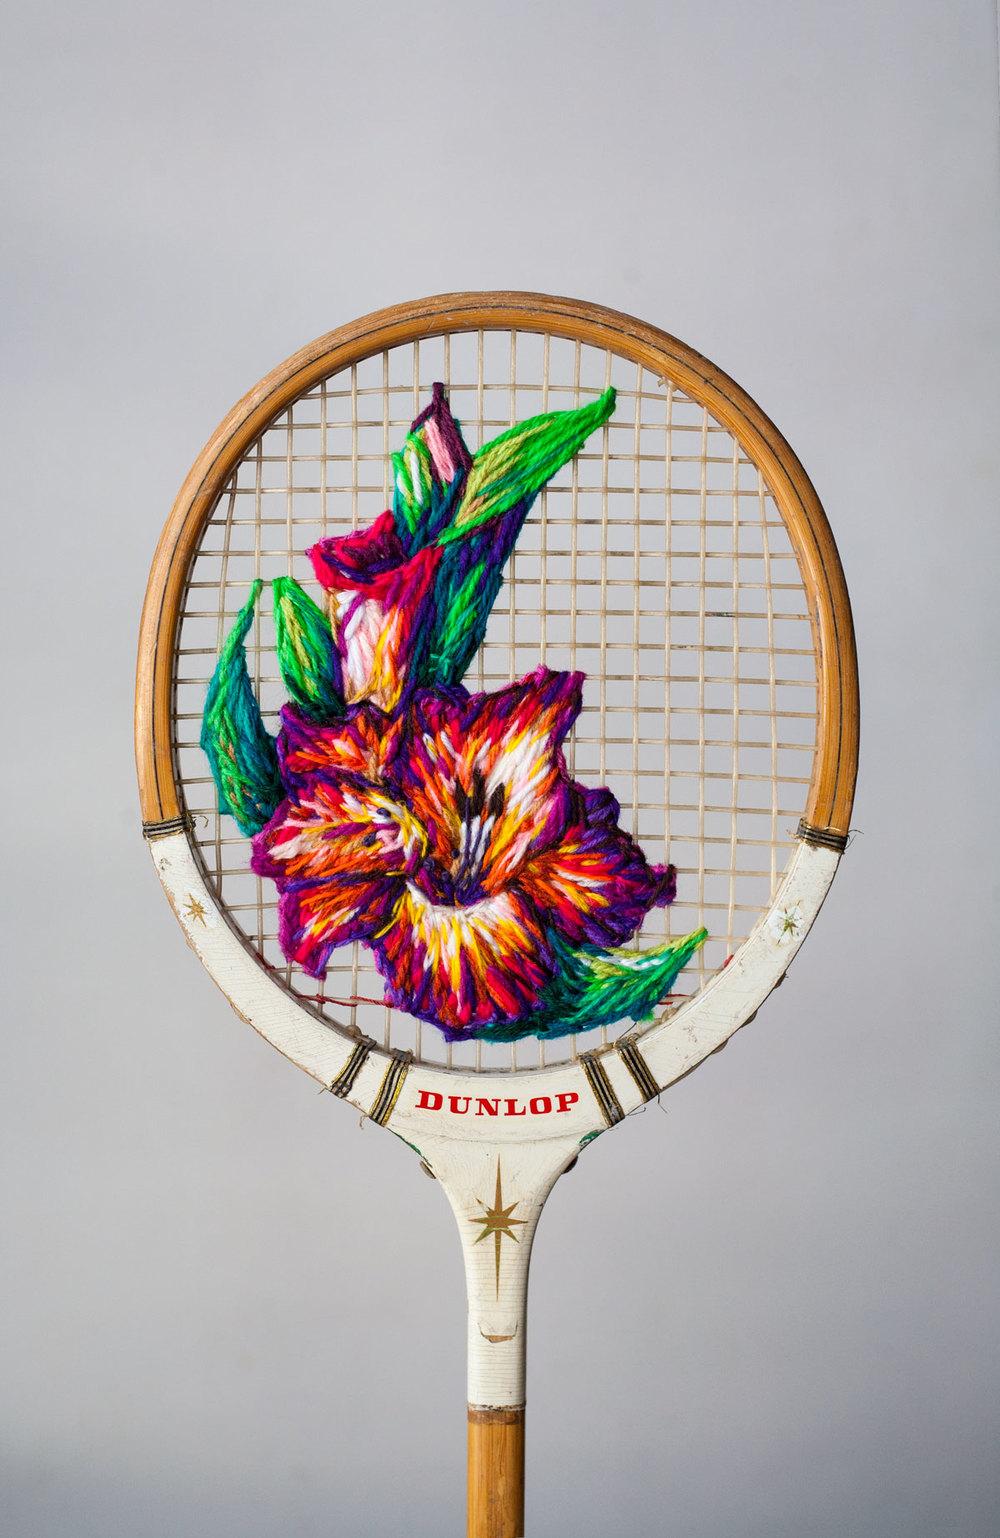 danielle-clough-racket-goodfromyou-7.jpg